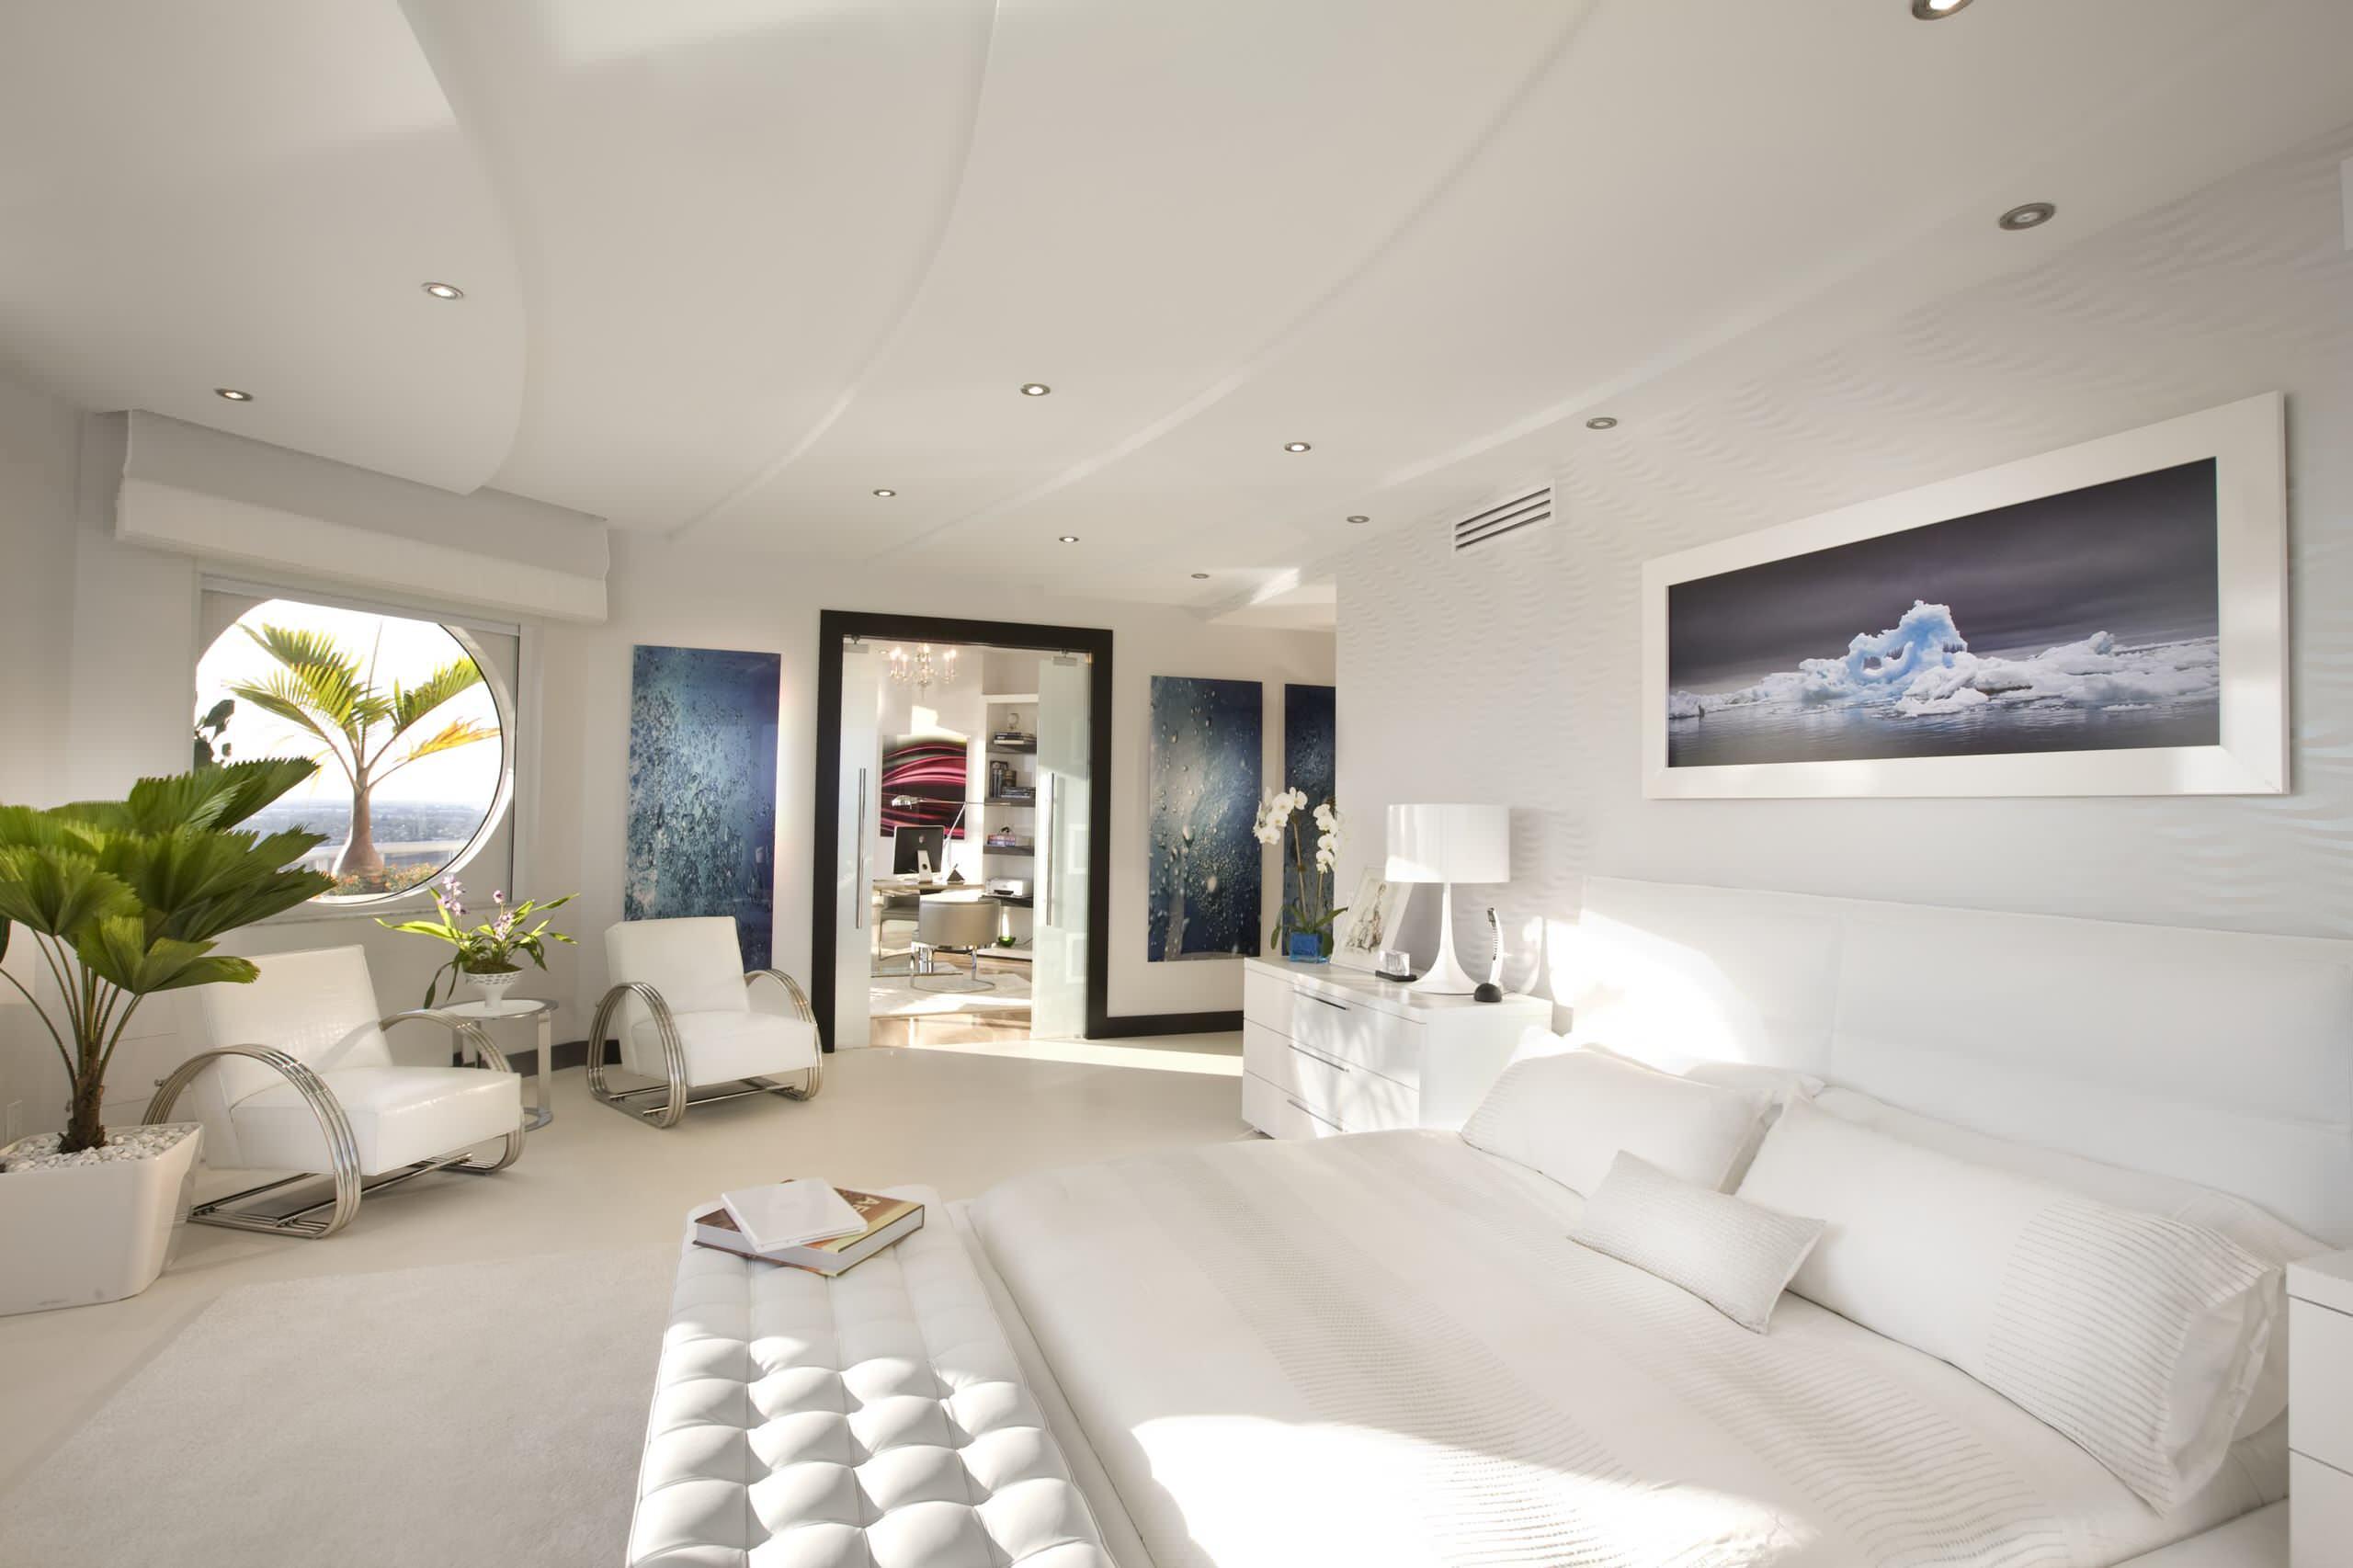 интерьер спальной комнаты по фен-шуй дизайн